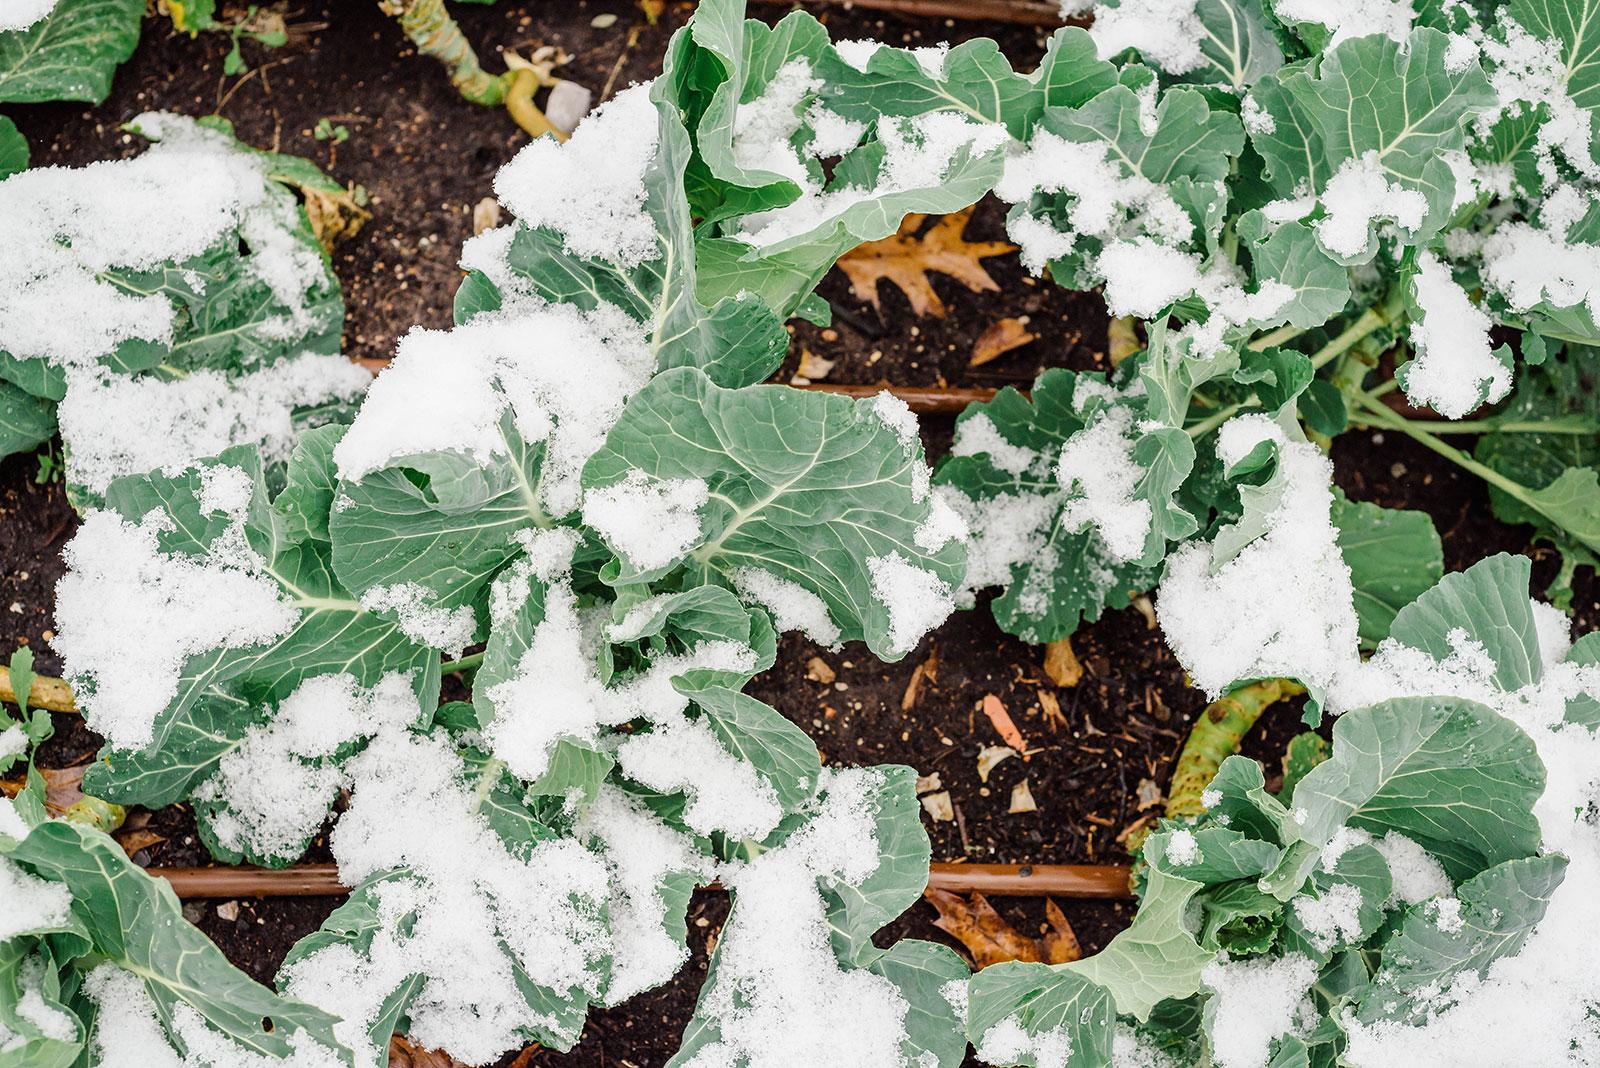 Snow-covered collard greens in a garden